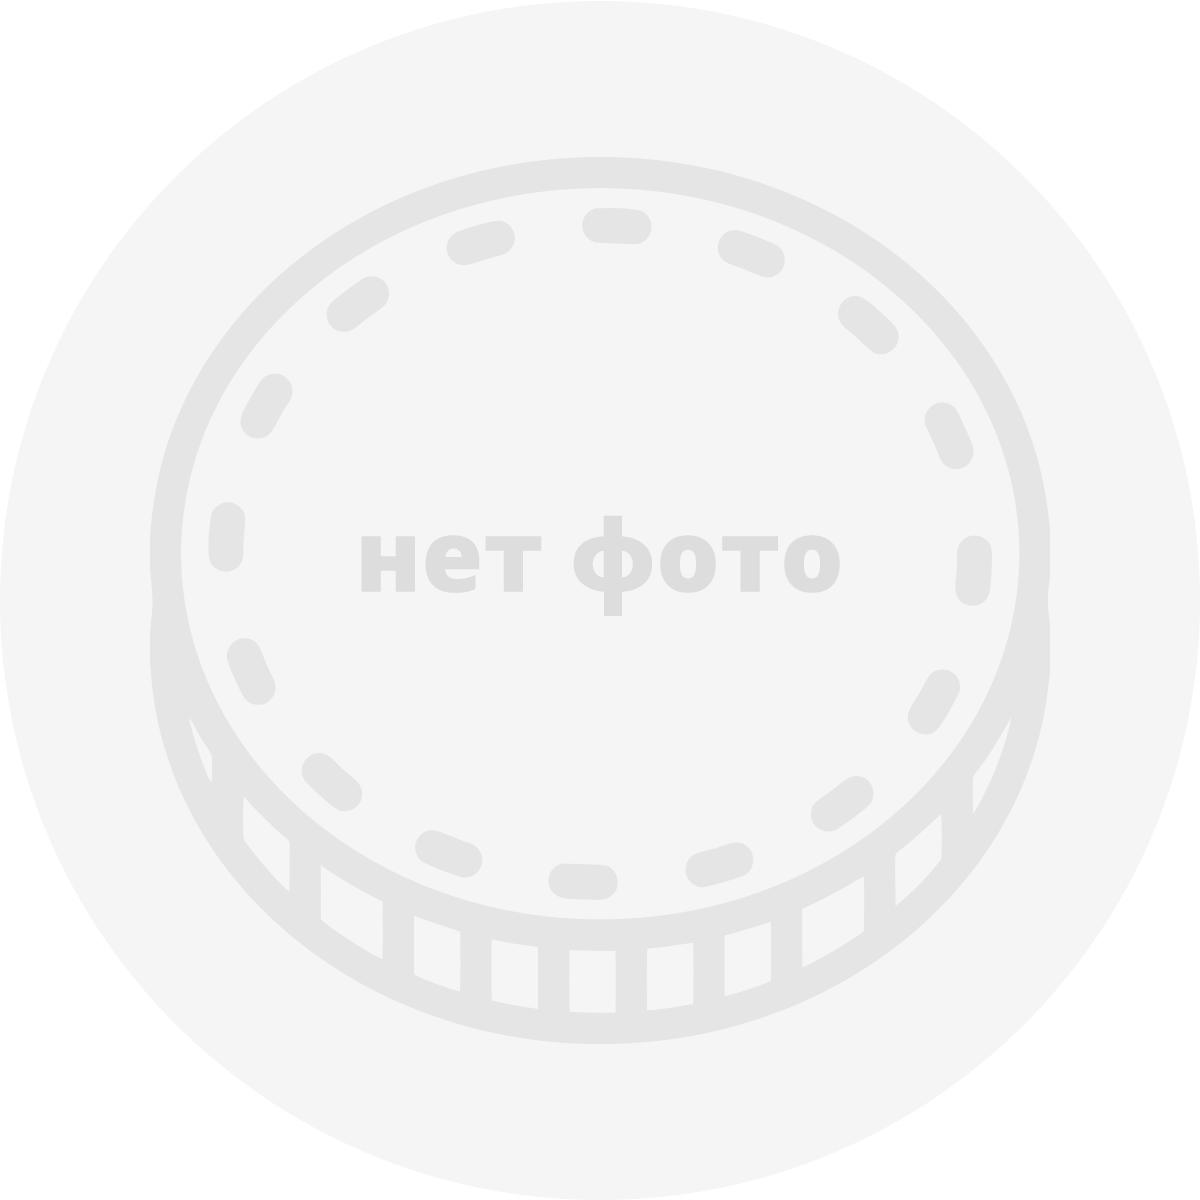 Острова Крозе, 100 франков